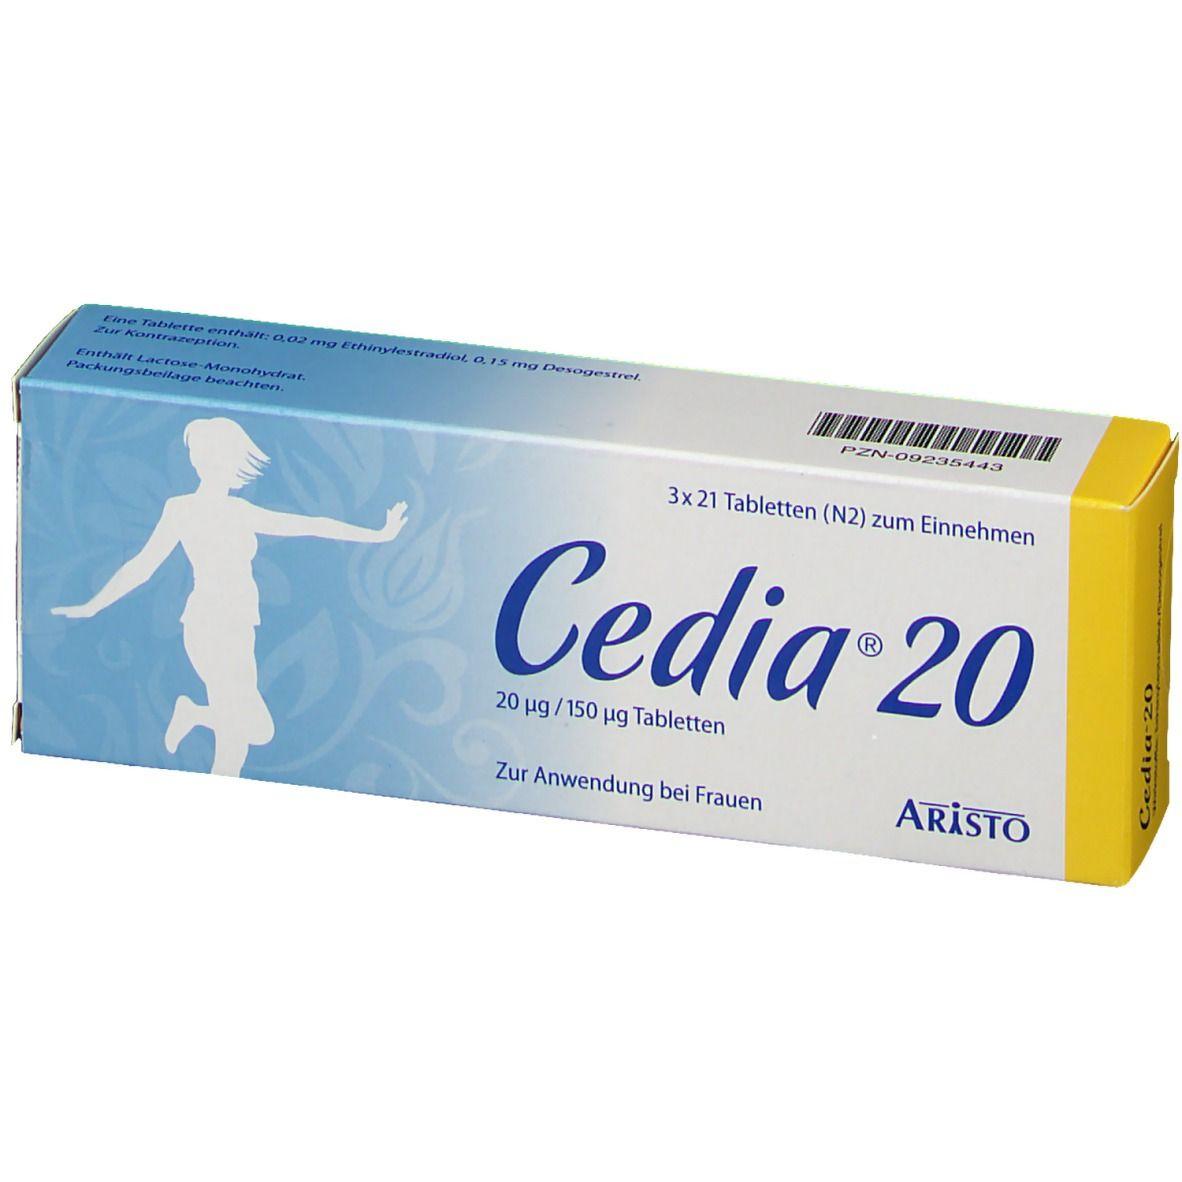 CEDIA 20 20 µg/150 µg Tabletten